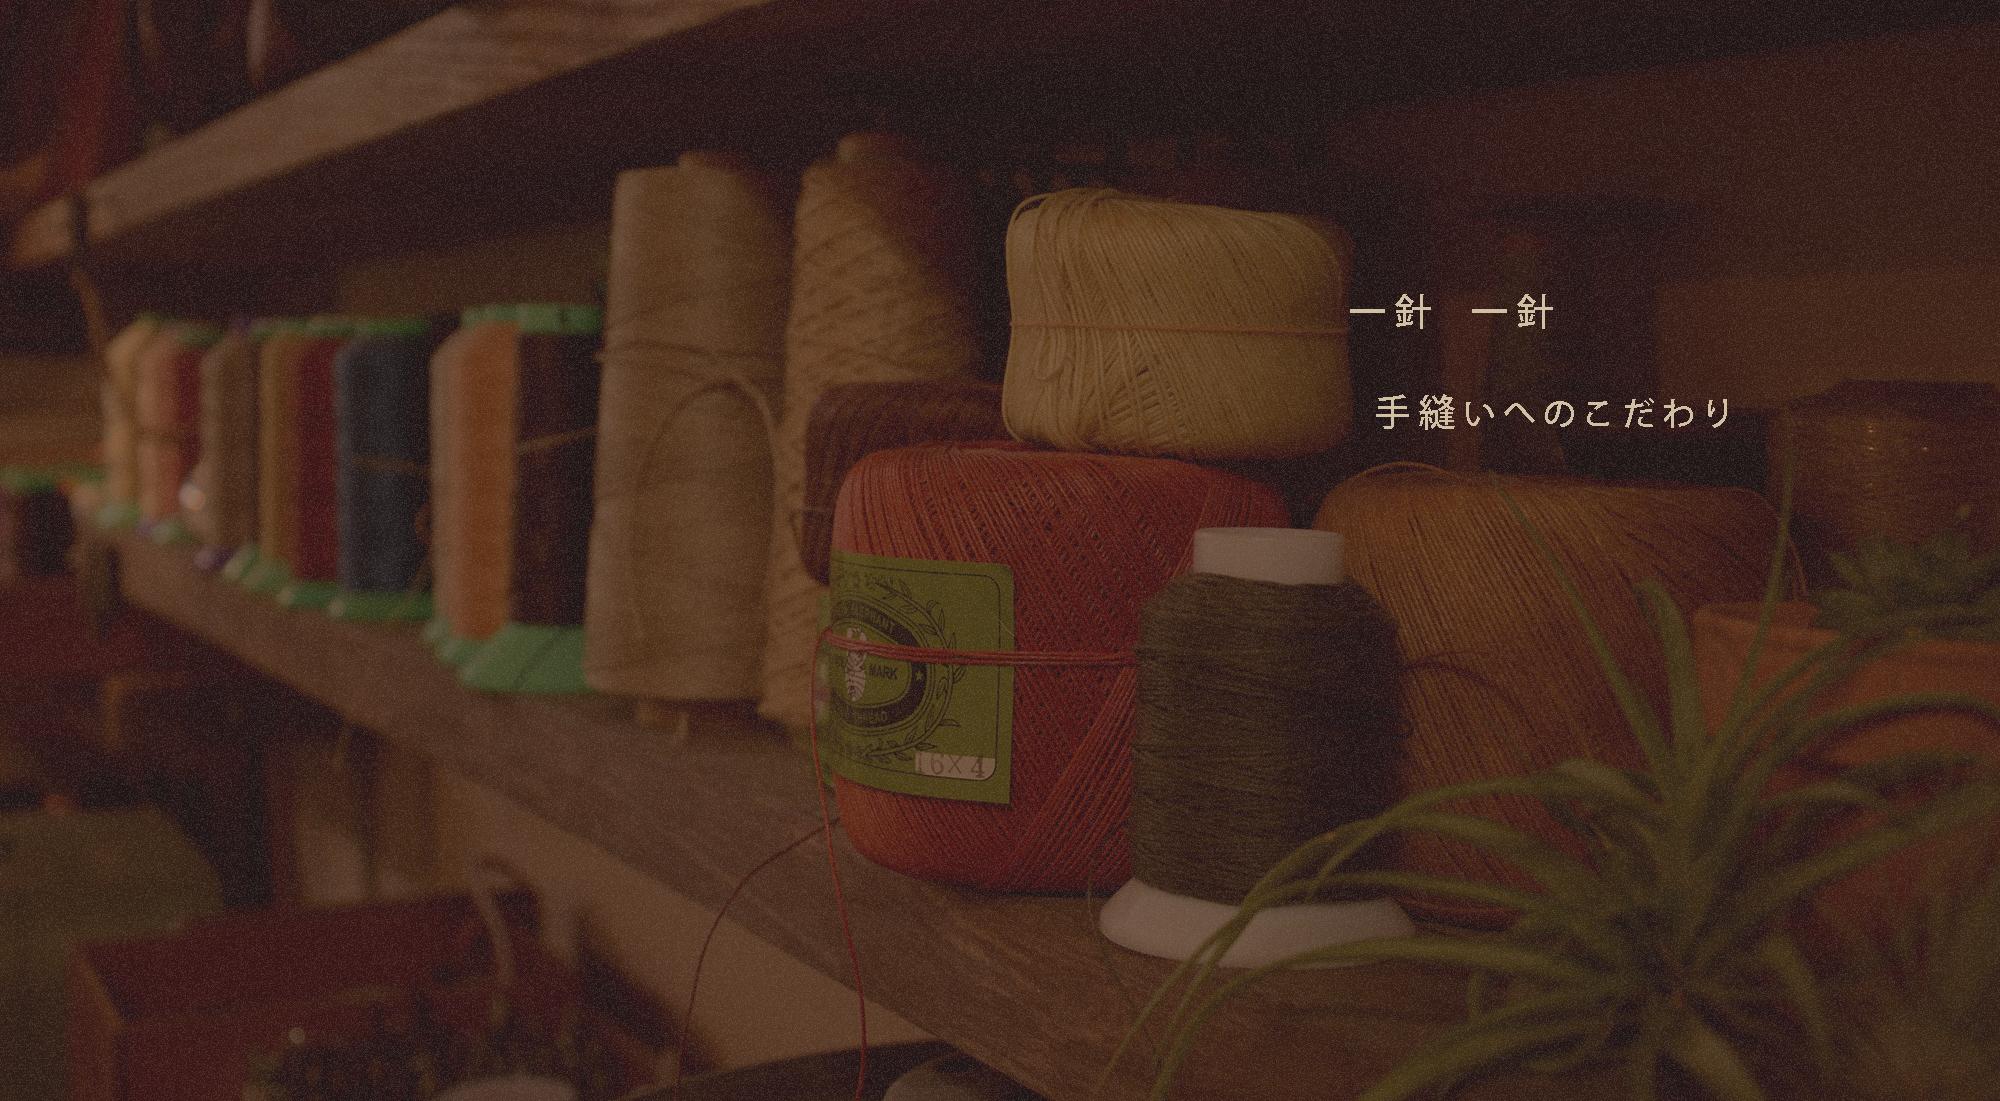 shujiworks手縫い革教室